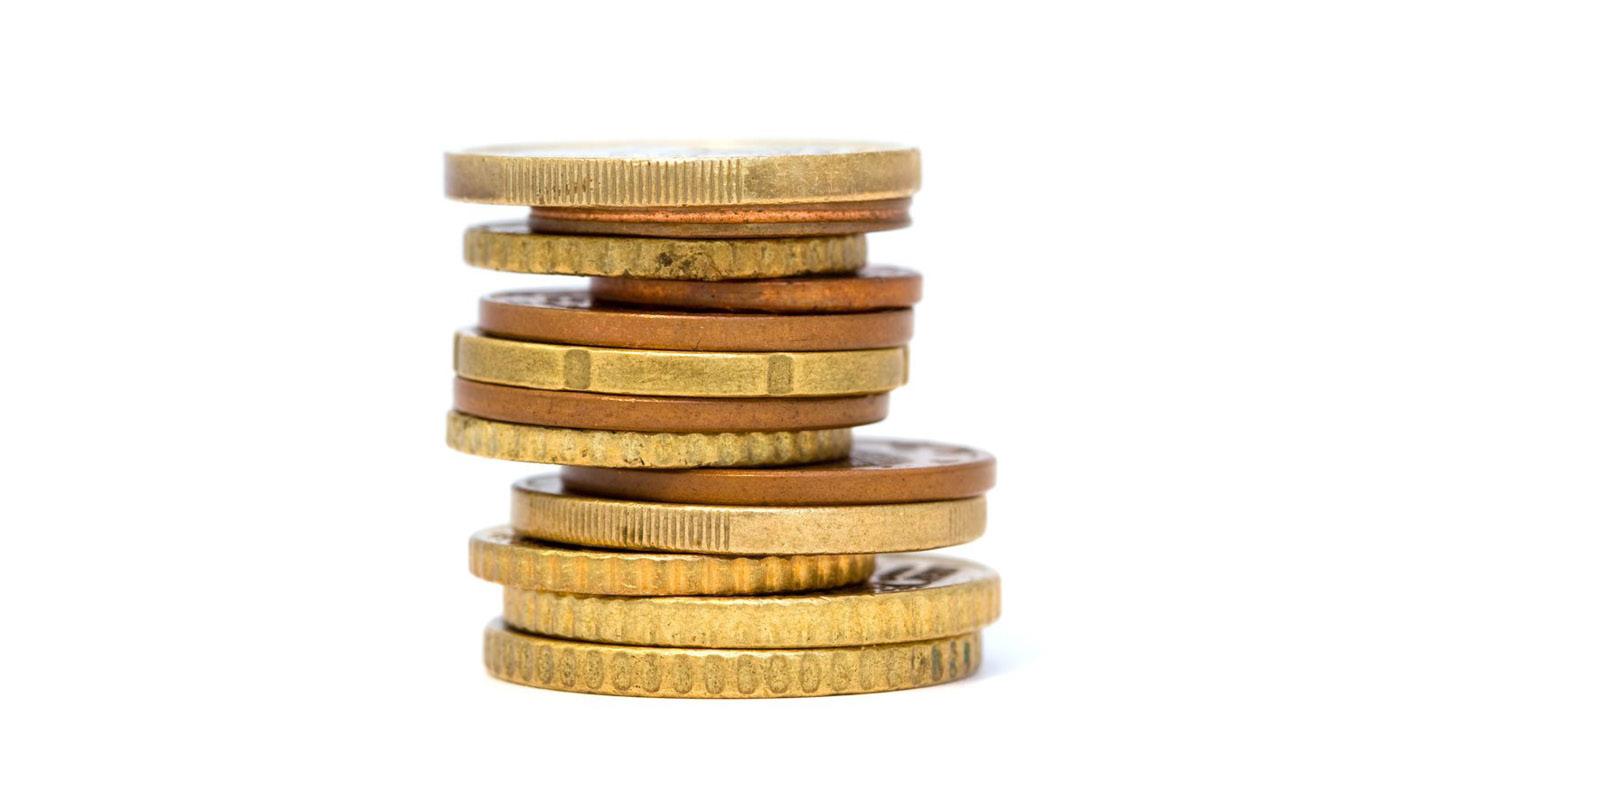 BayerBau Glücksmünzen